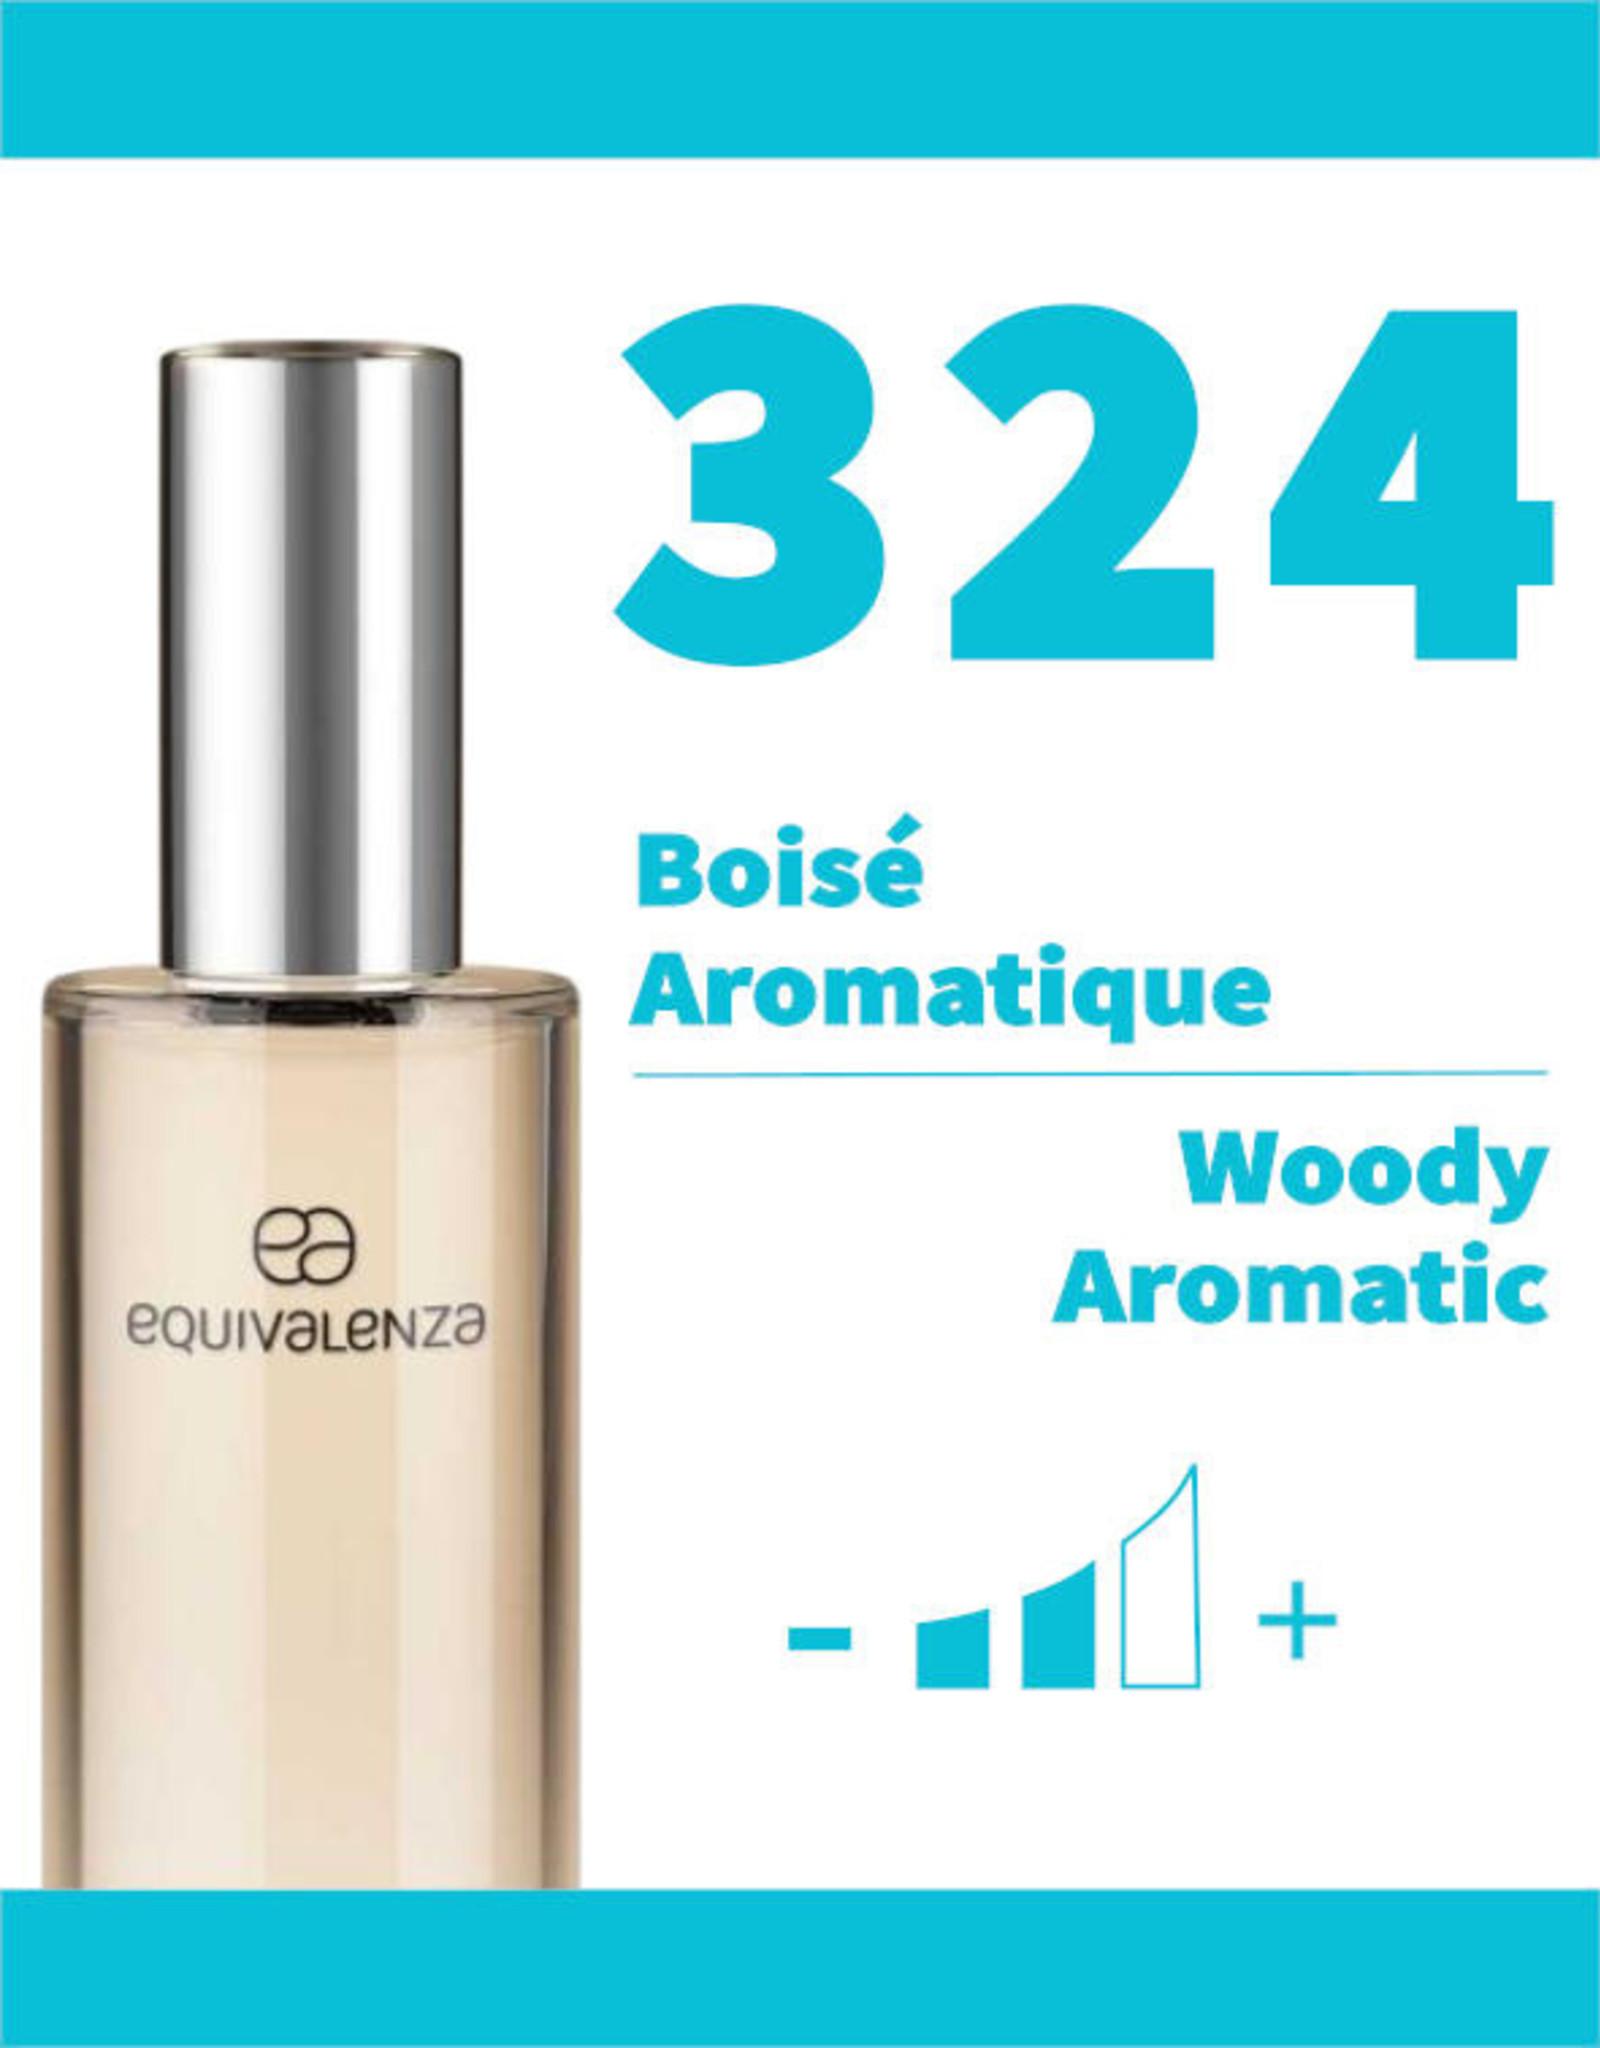 Equivalenza Eau de Parfum Woody Aromatic 324